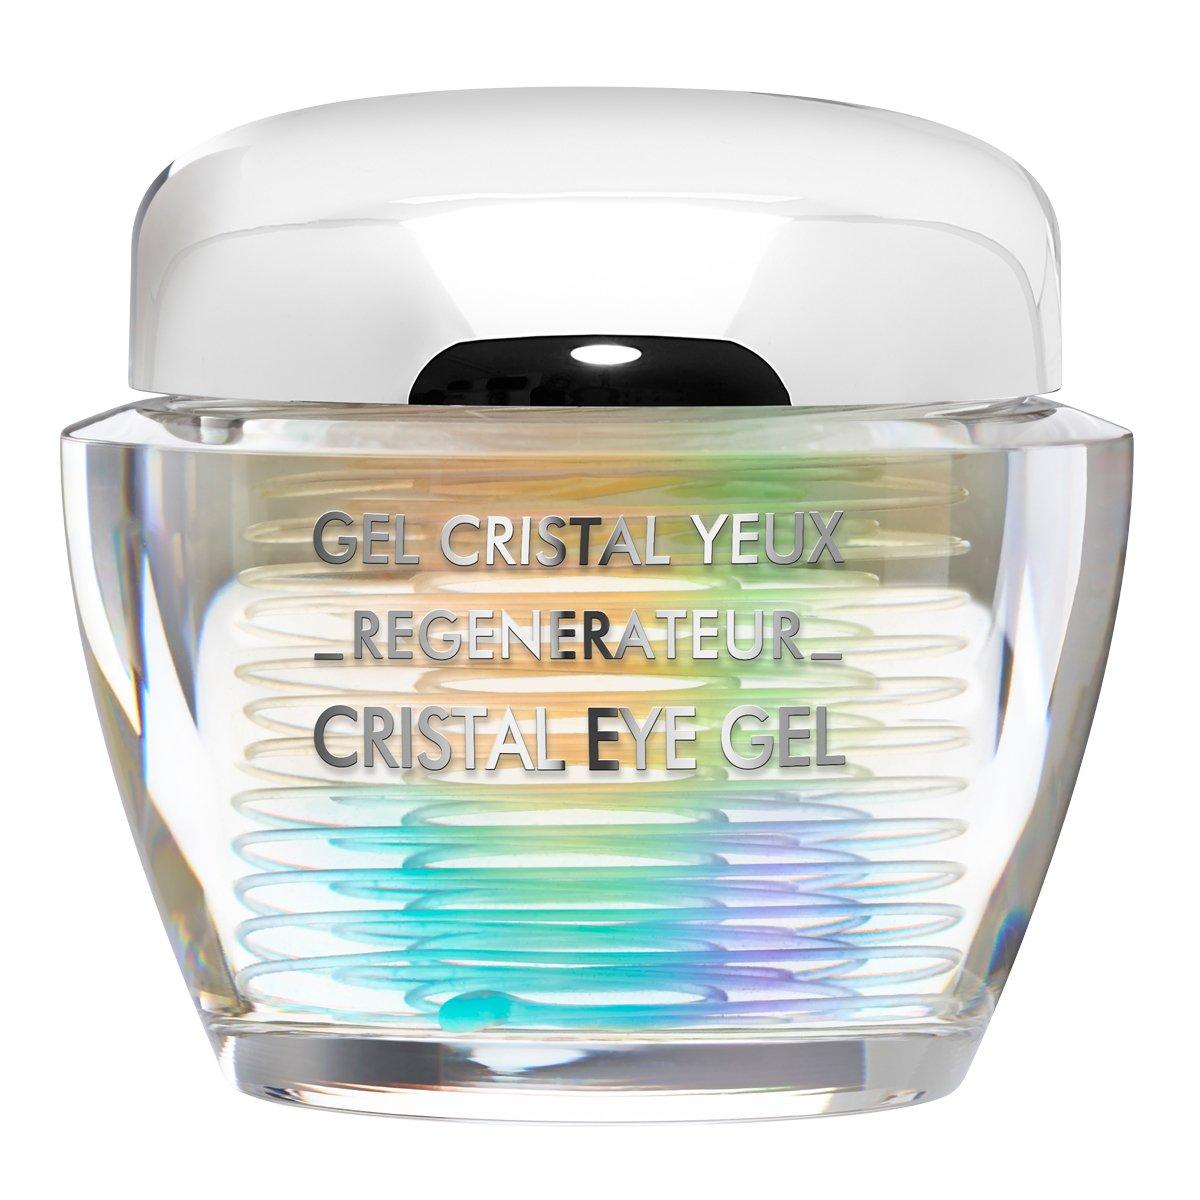 Ingrid Millet Gel Cristal Yeux, Augengel, 15 ml 3471343011706 12516_15ml